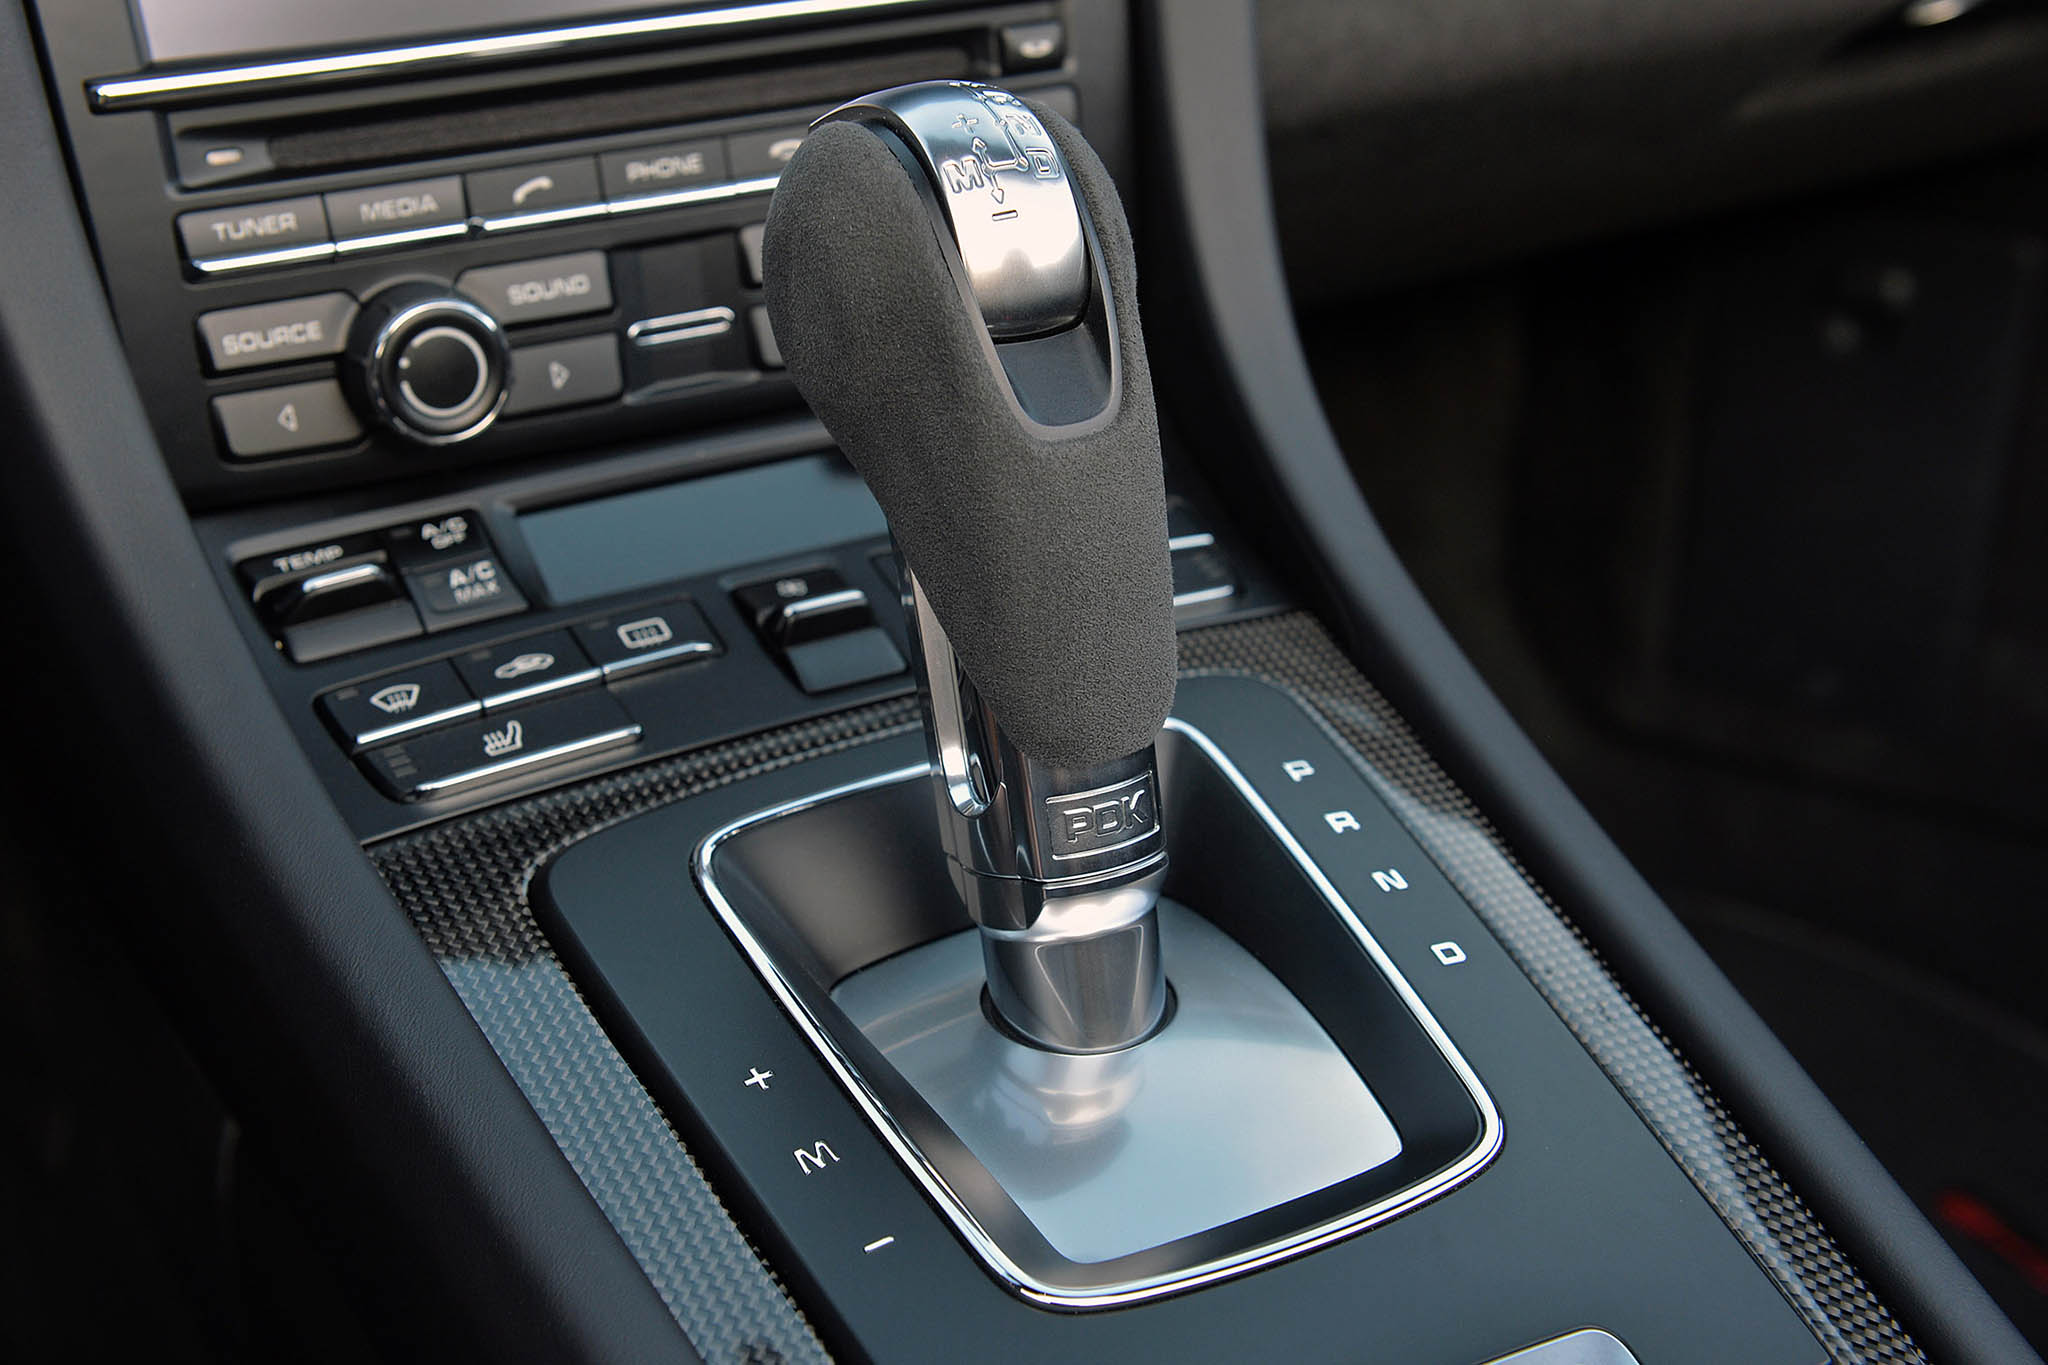 Stick shift vs automatic